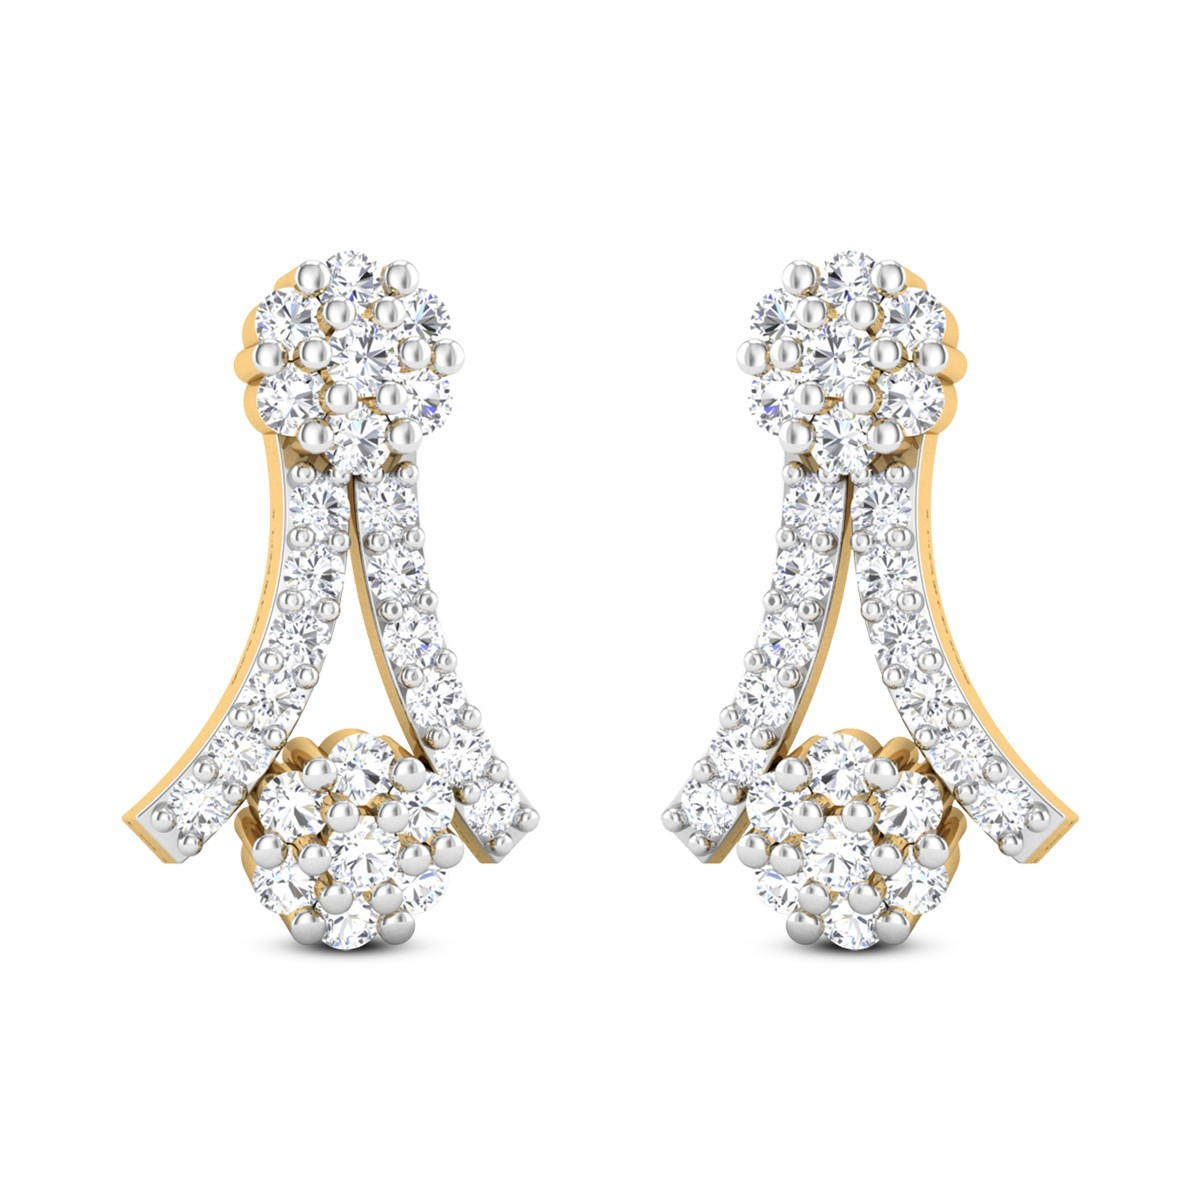 Fairy of Vitality Diamond Earrings